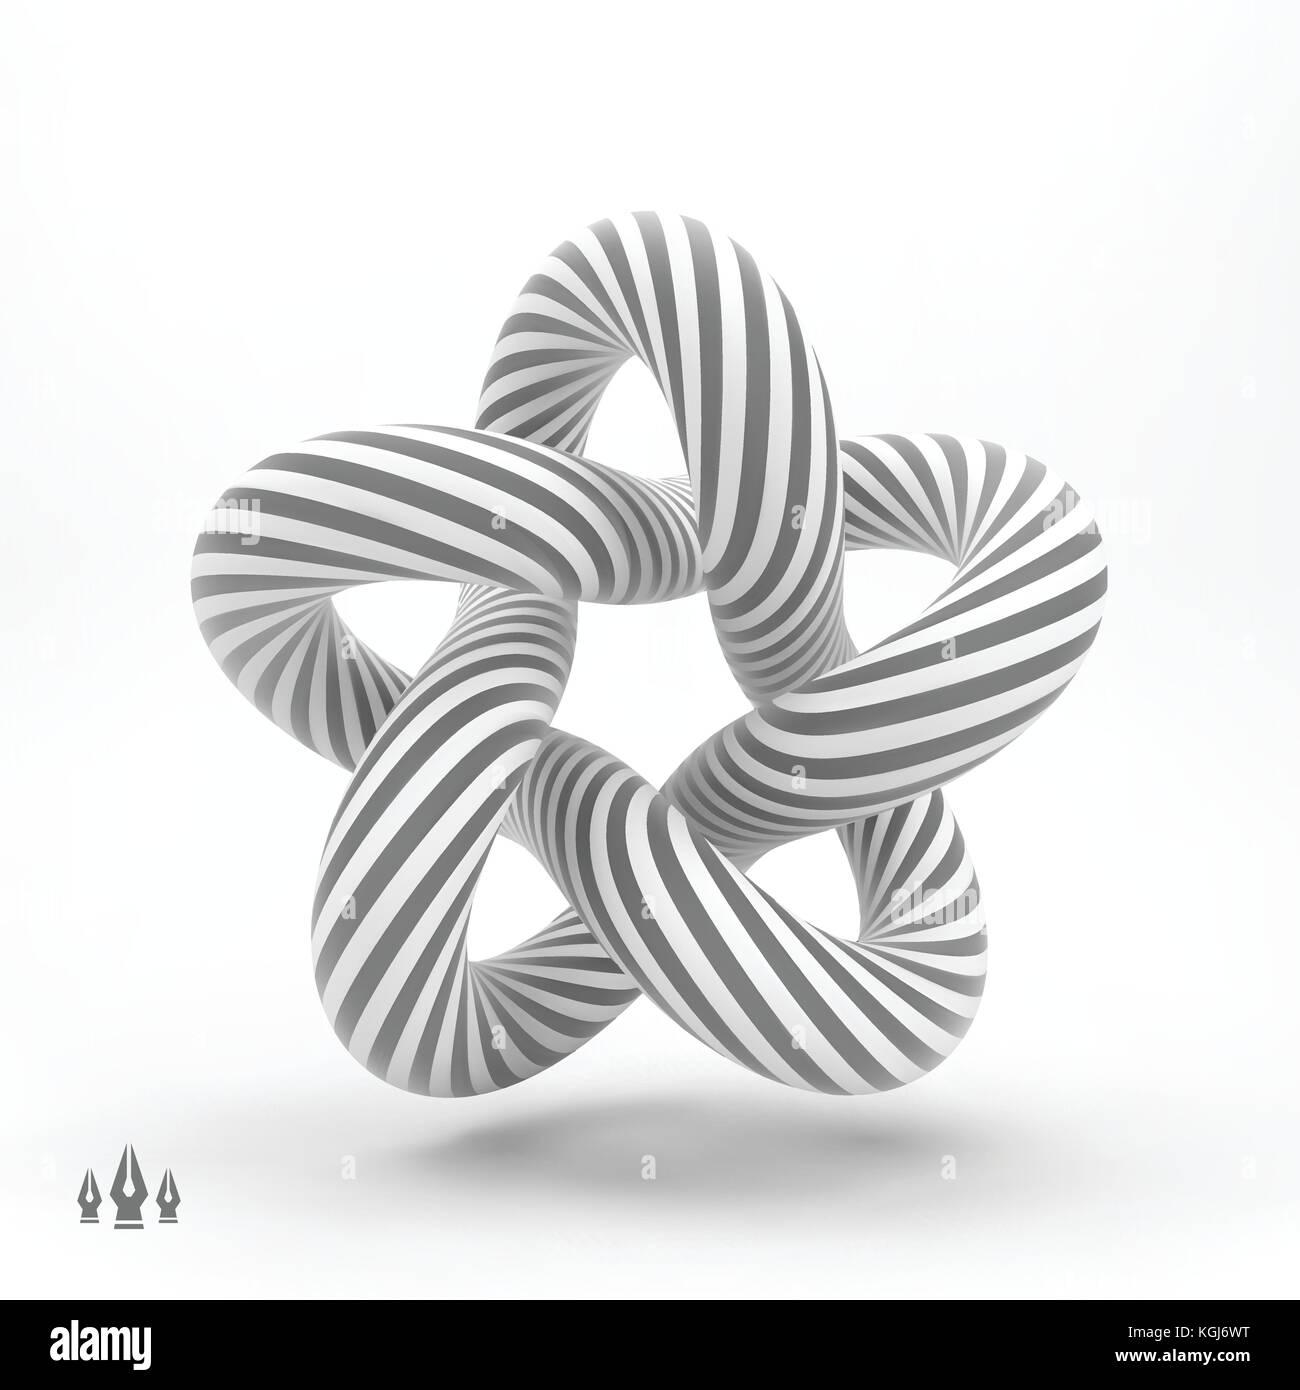 Star  3d geometric shape  Symbol of three-dimensionality